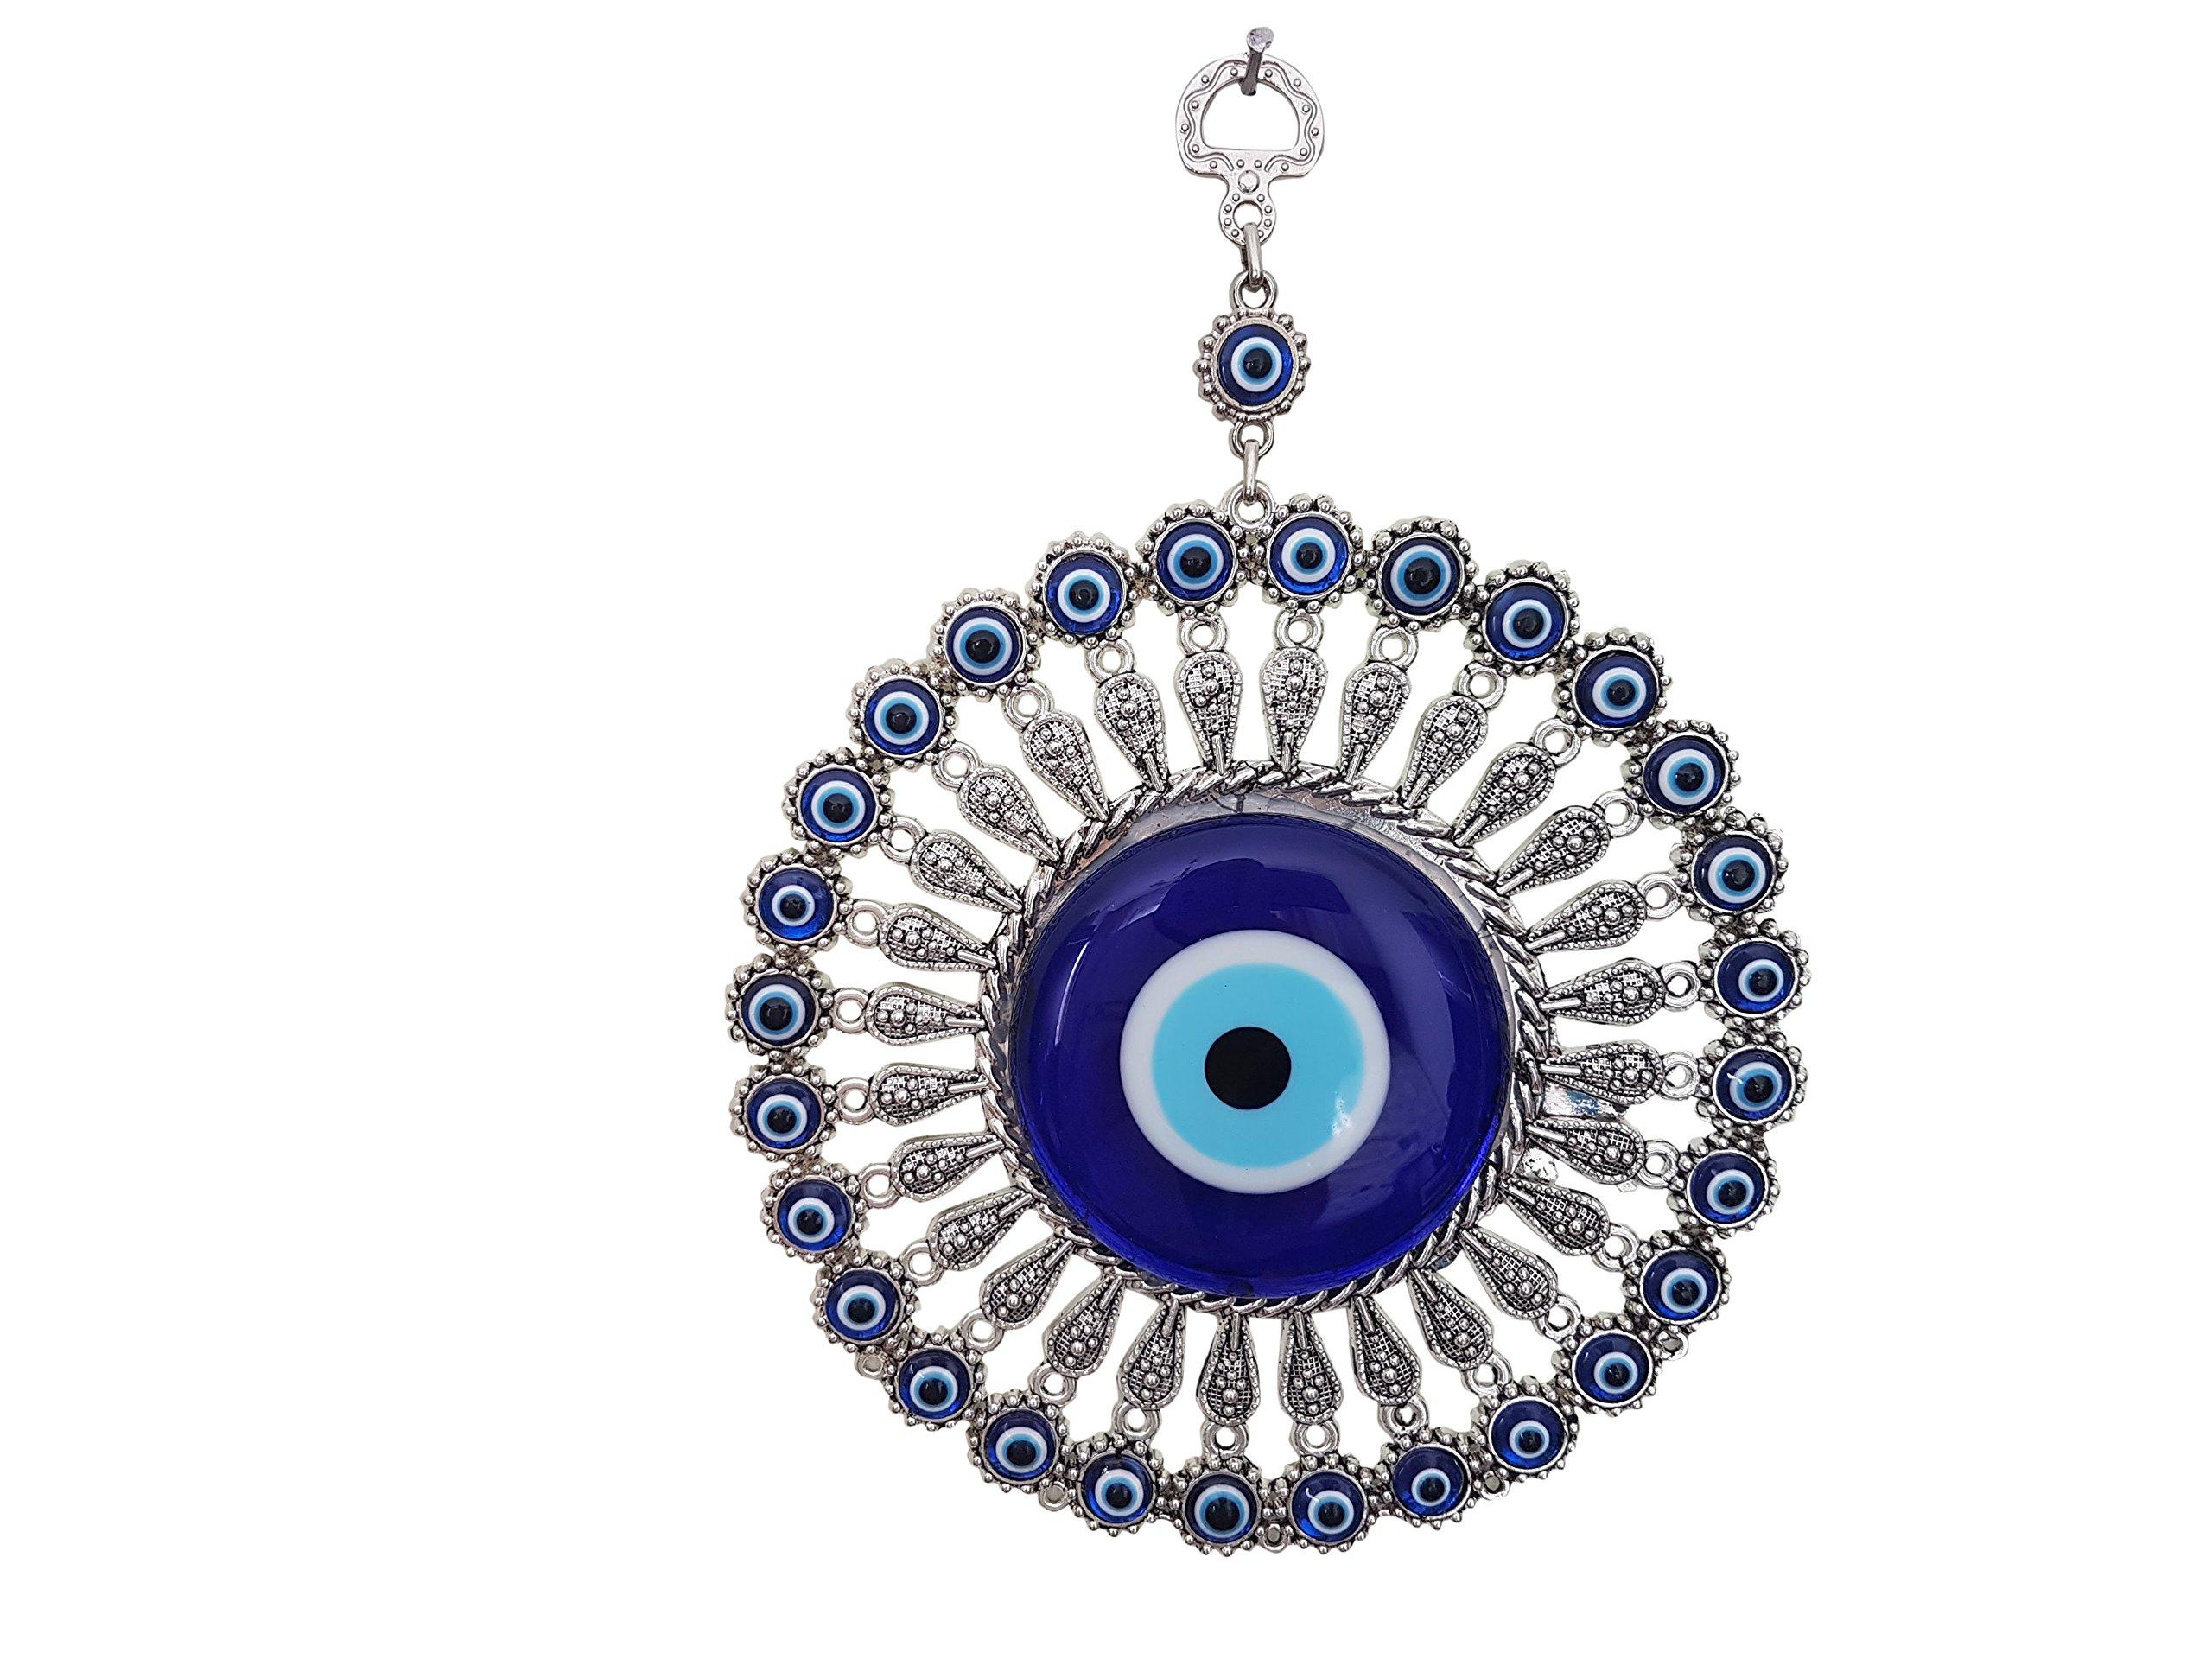 Bead Global Turkish Big Glass Turkish Evil Eye Bead Home Protection Charm-Hanging Ornament Wall Decor by Bead Global